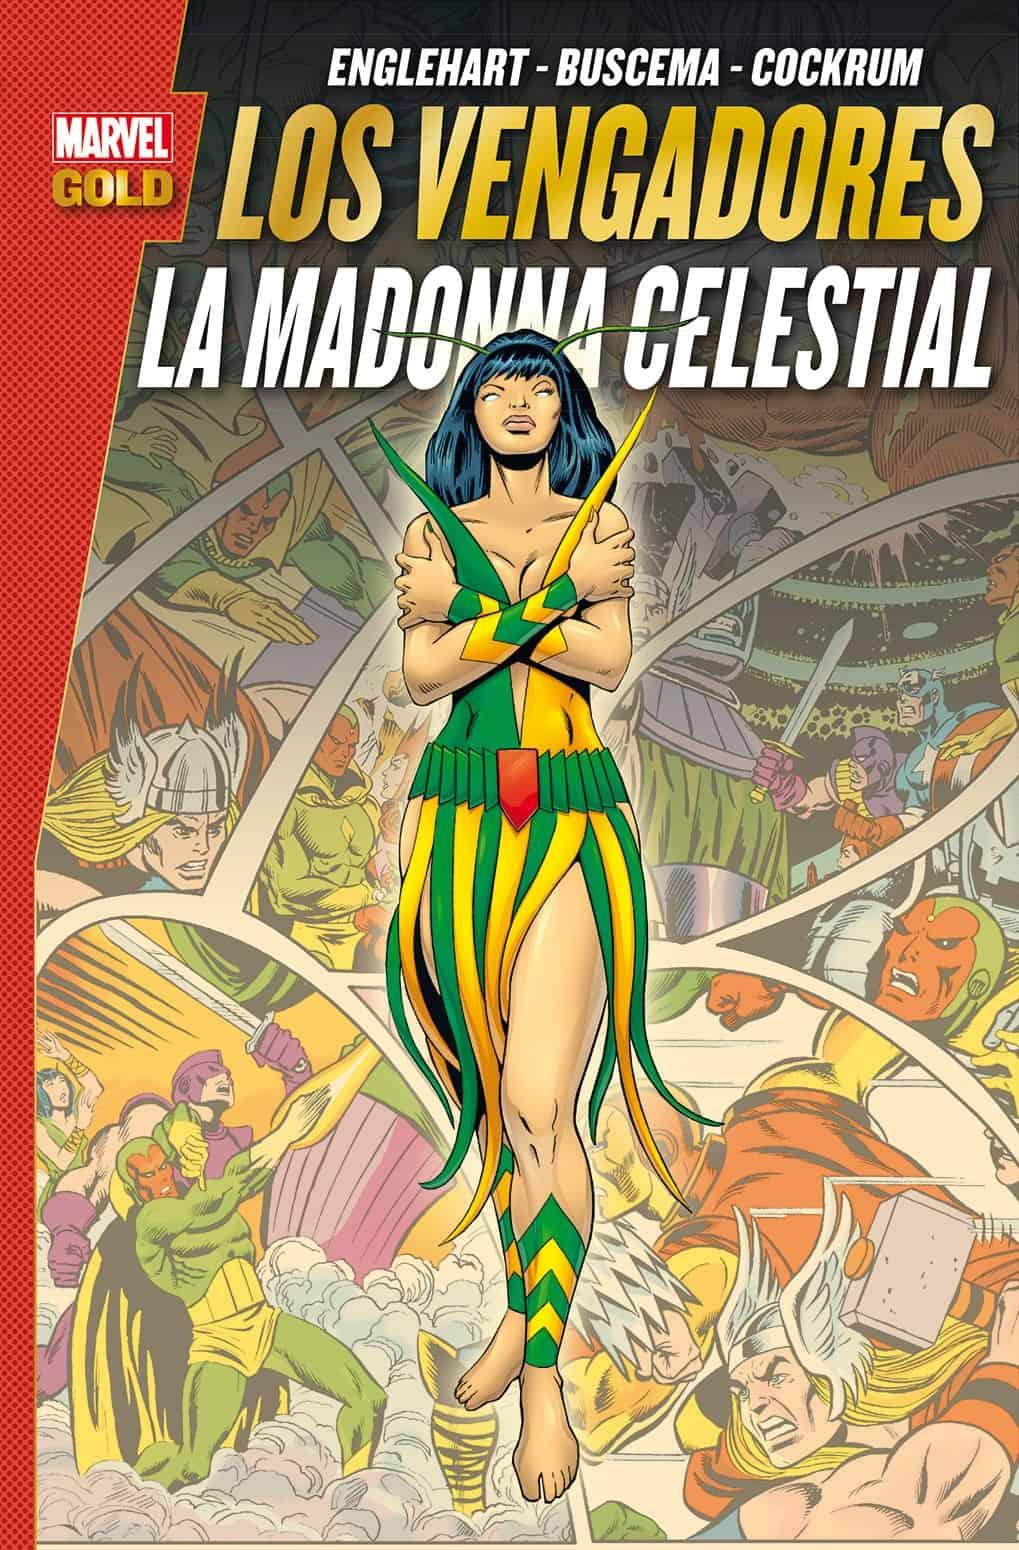 LOS VENGADORES. LA MADONNA CELESTIAL (MARVEL GOLD)